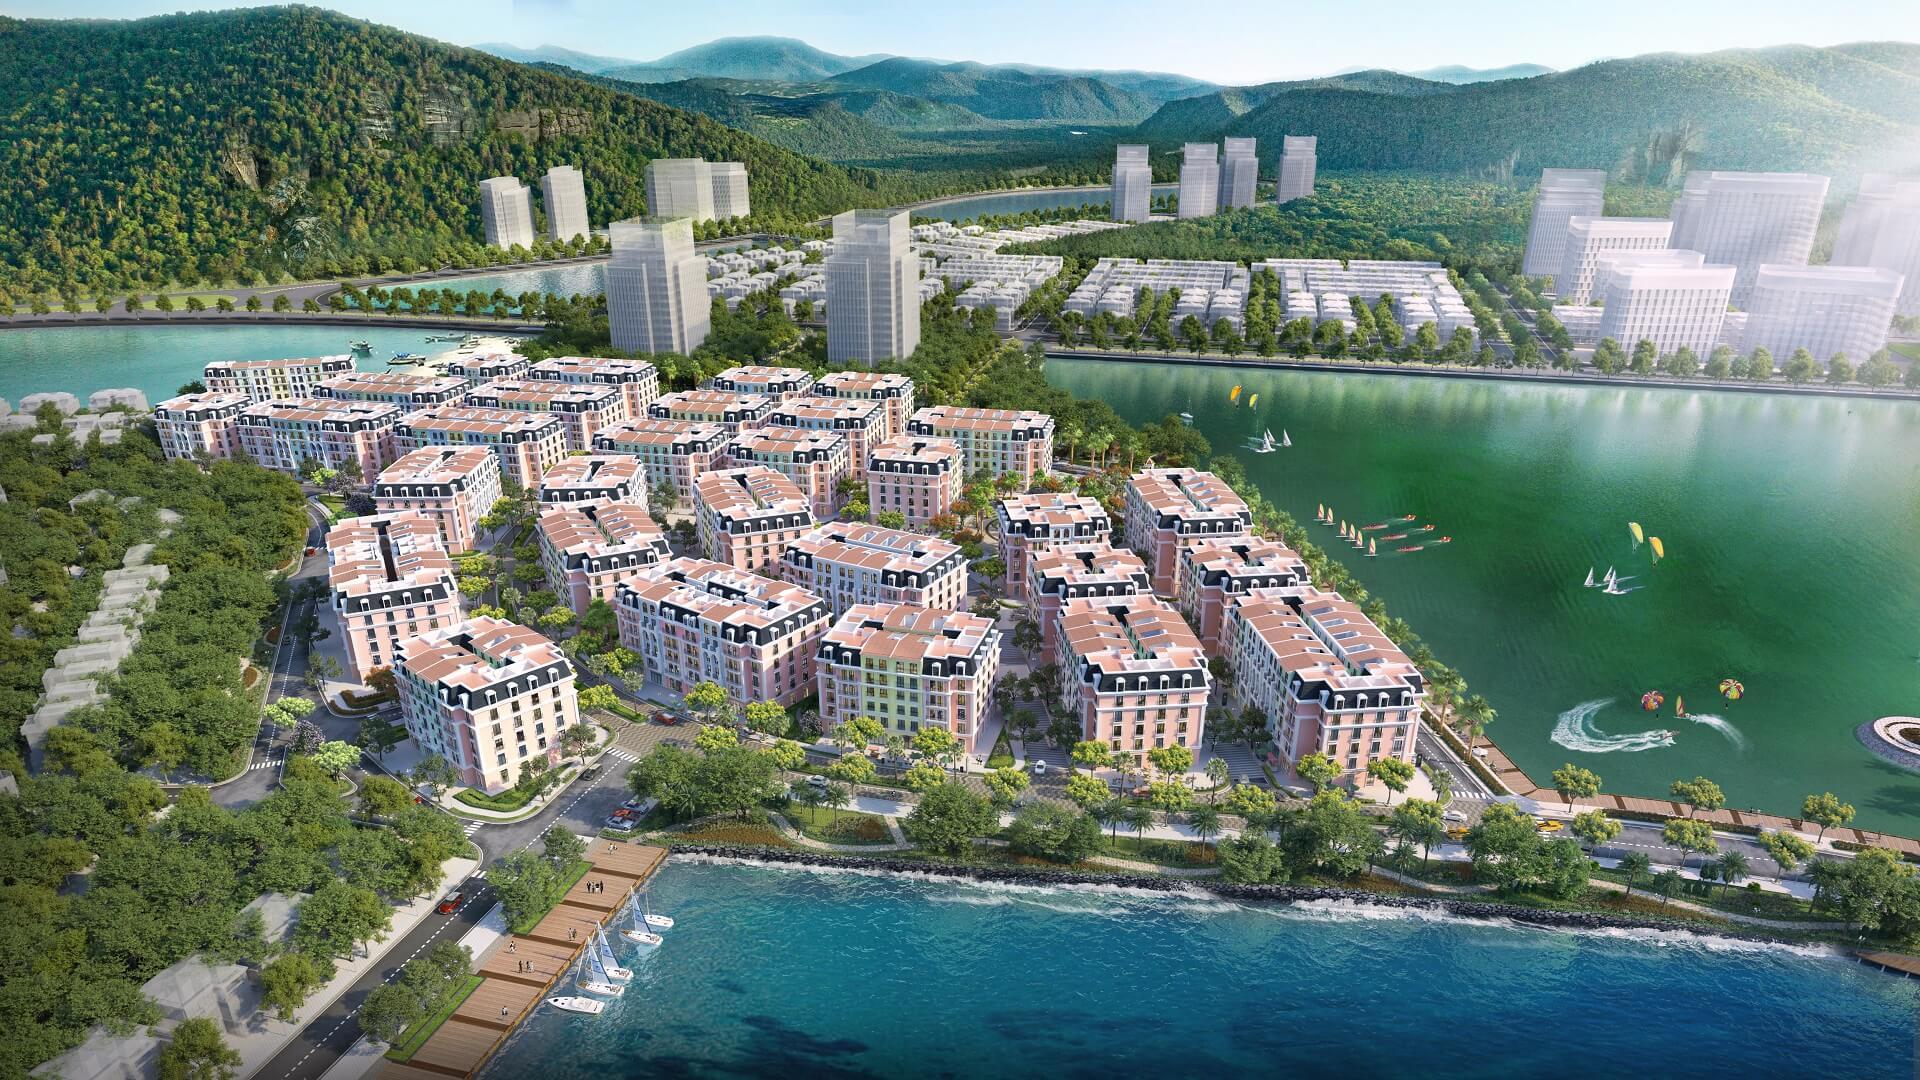 Tổng quan dự án Aqua City Hạ Long